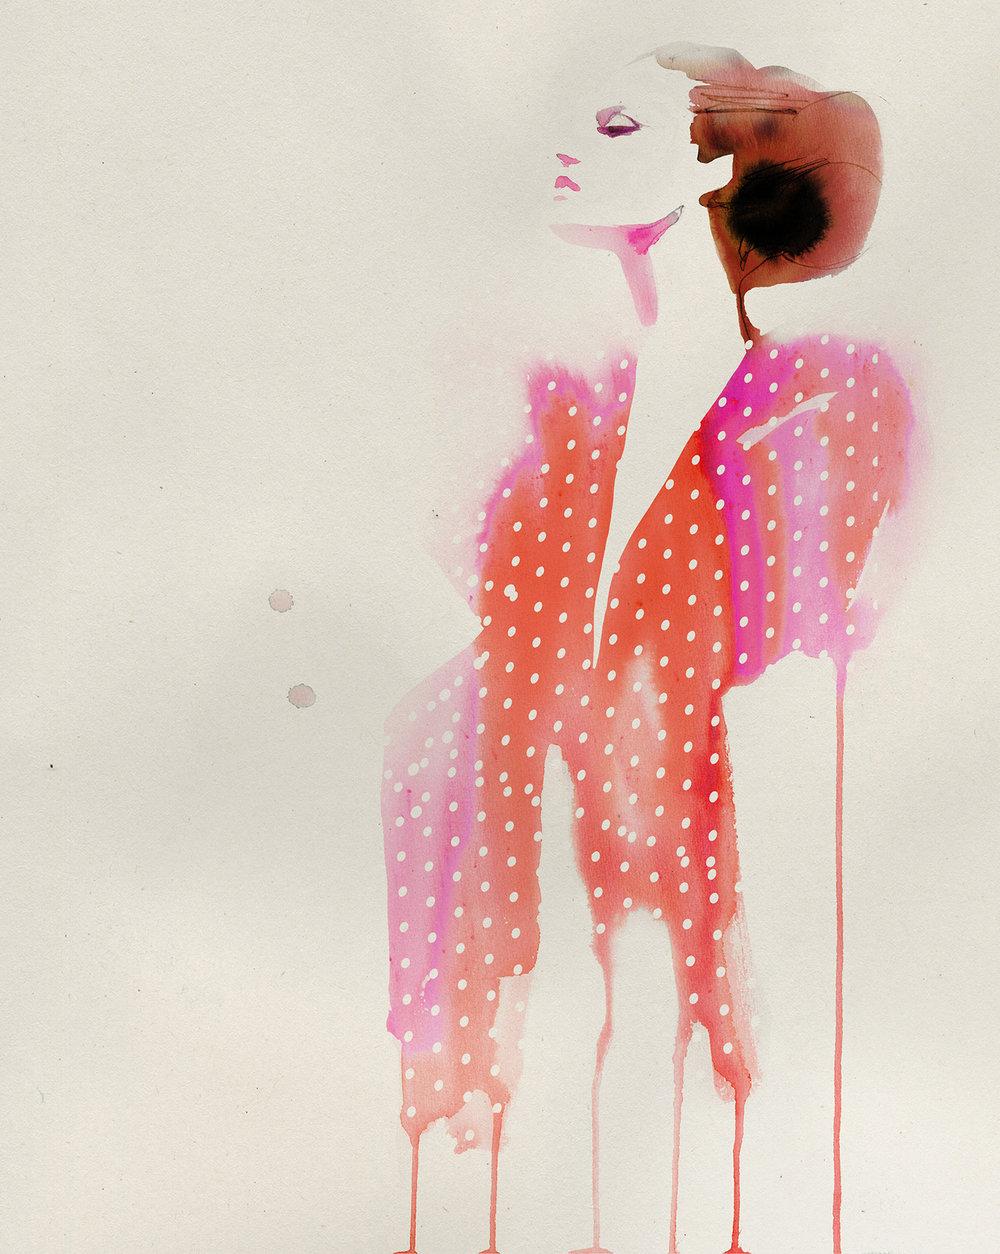 stina-persson-watercolor-ida-sjostedt-polka-dots.jpg